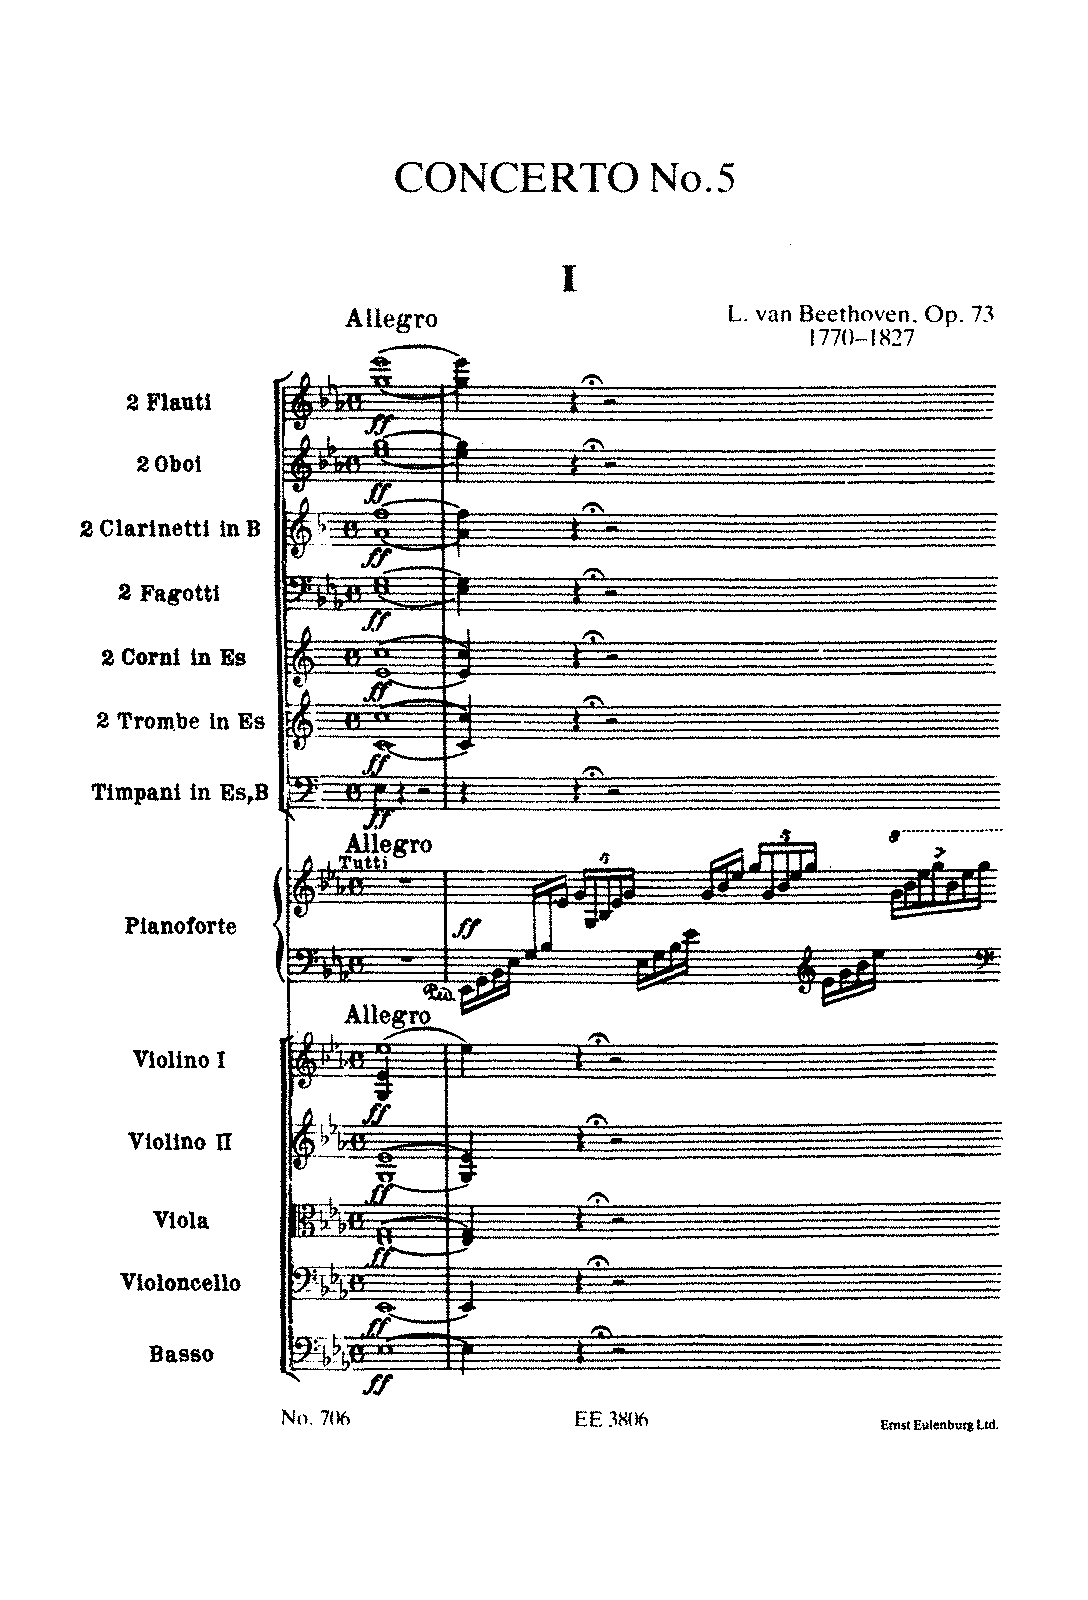 Piano Concerto No.5, Op.73 (Beethoven, Ludwig van) - IMSLP ...